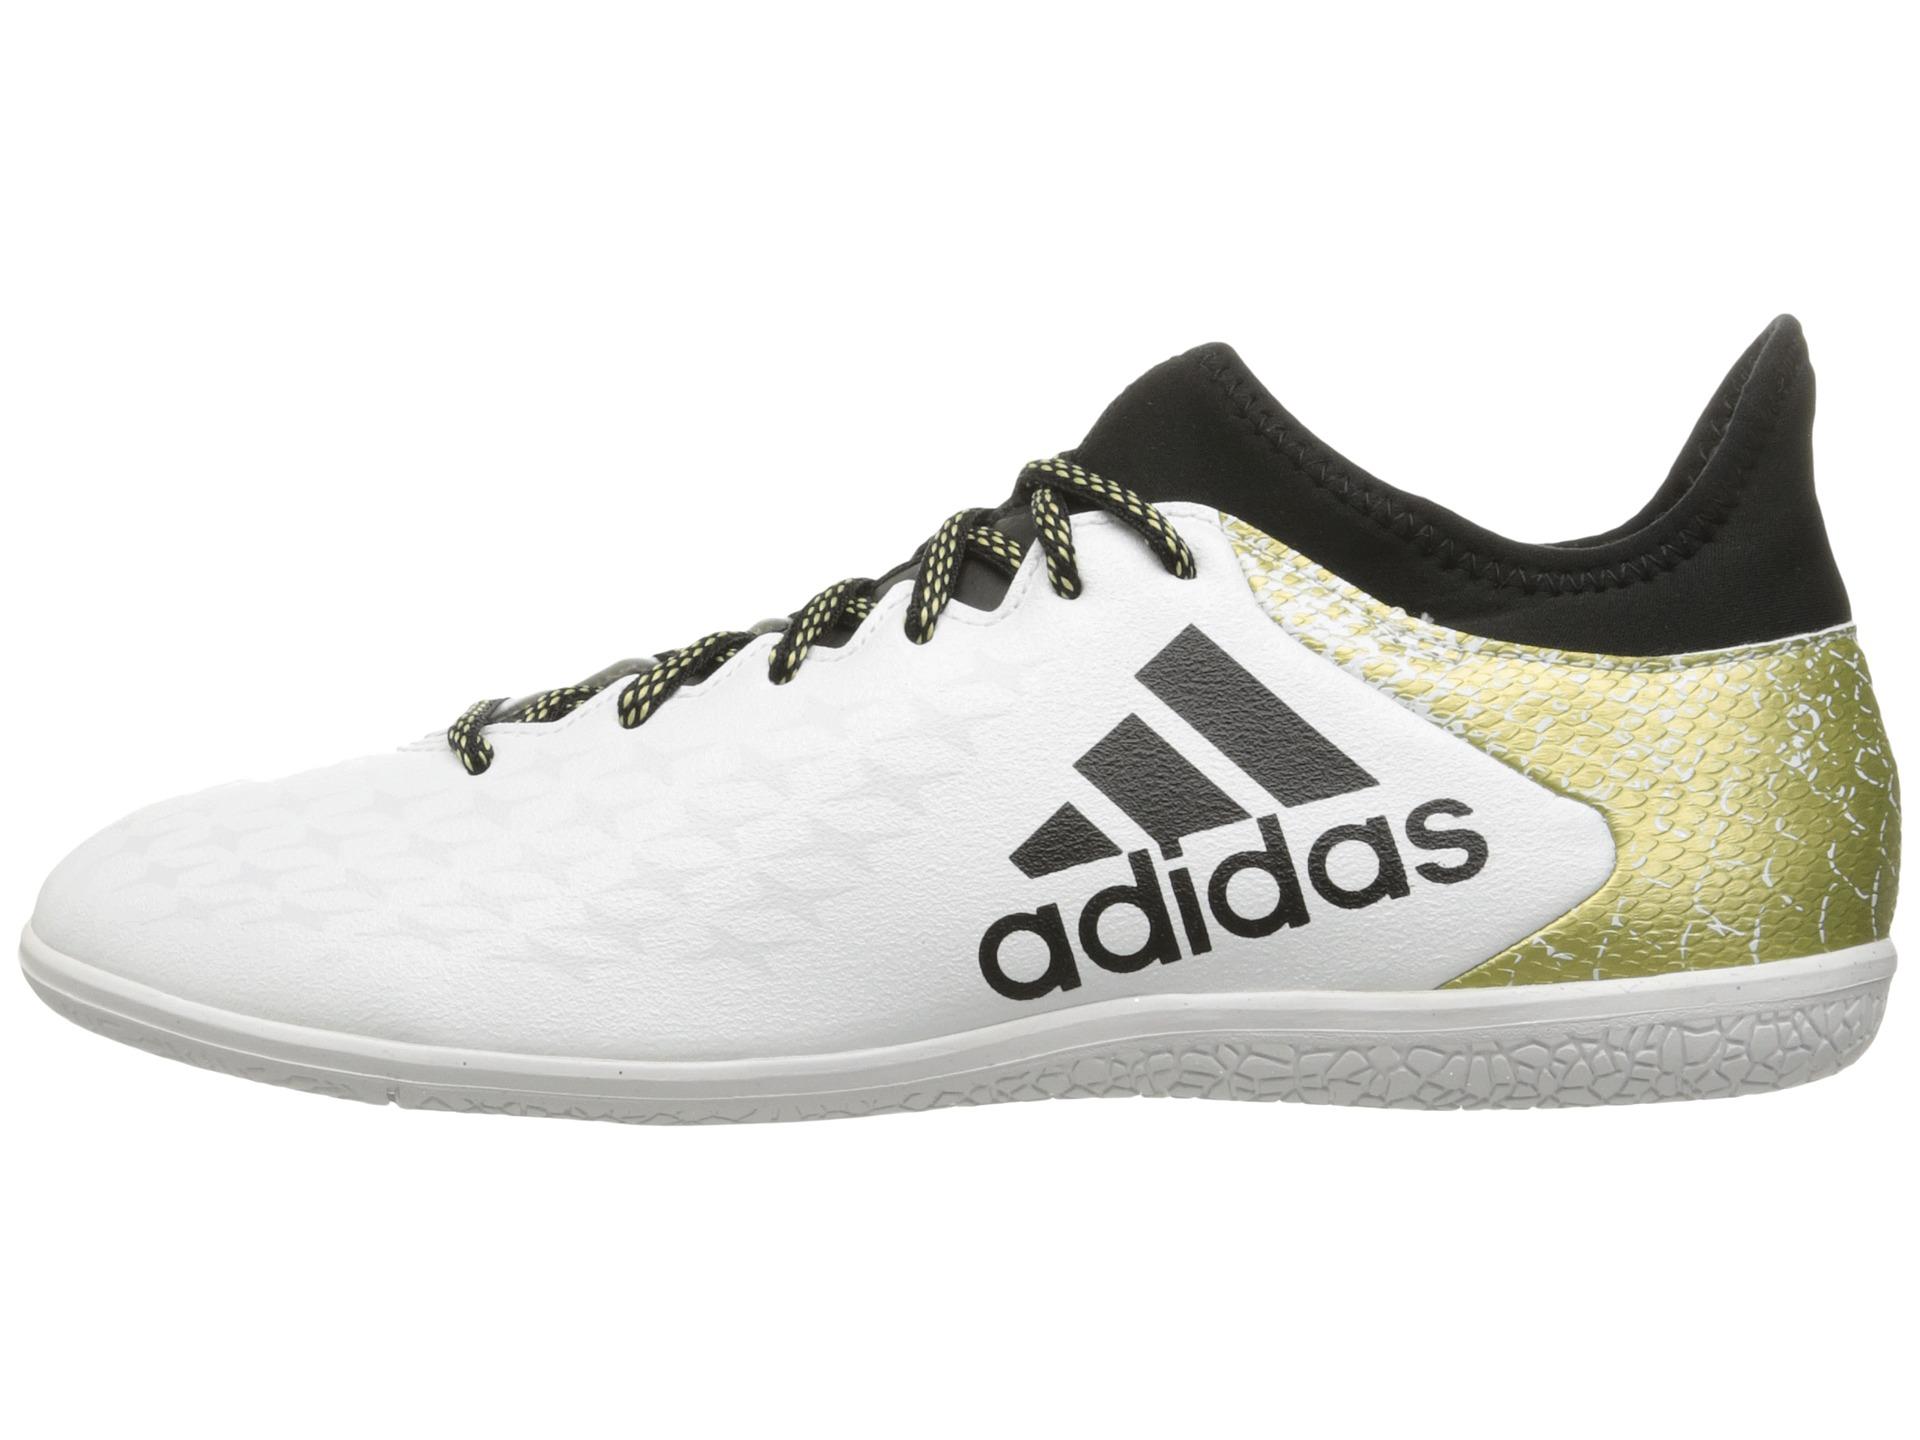 adidas X 16.3 IN - Zappos.com Free Shipping BOTH Ways